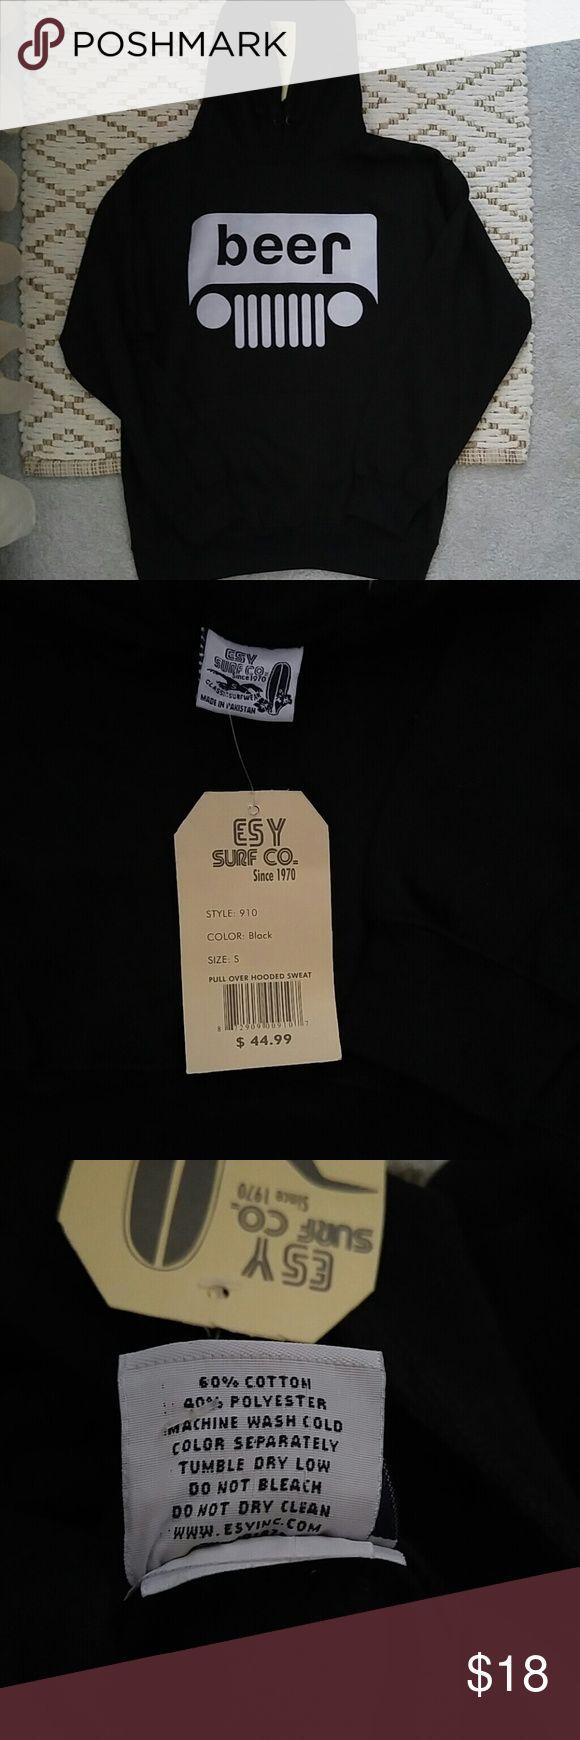 Jeep hooded sweatshirt Comfy women's sweatshirt never worn make an offer! ESY surf co Tops Sweatshirts & Hoodies